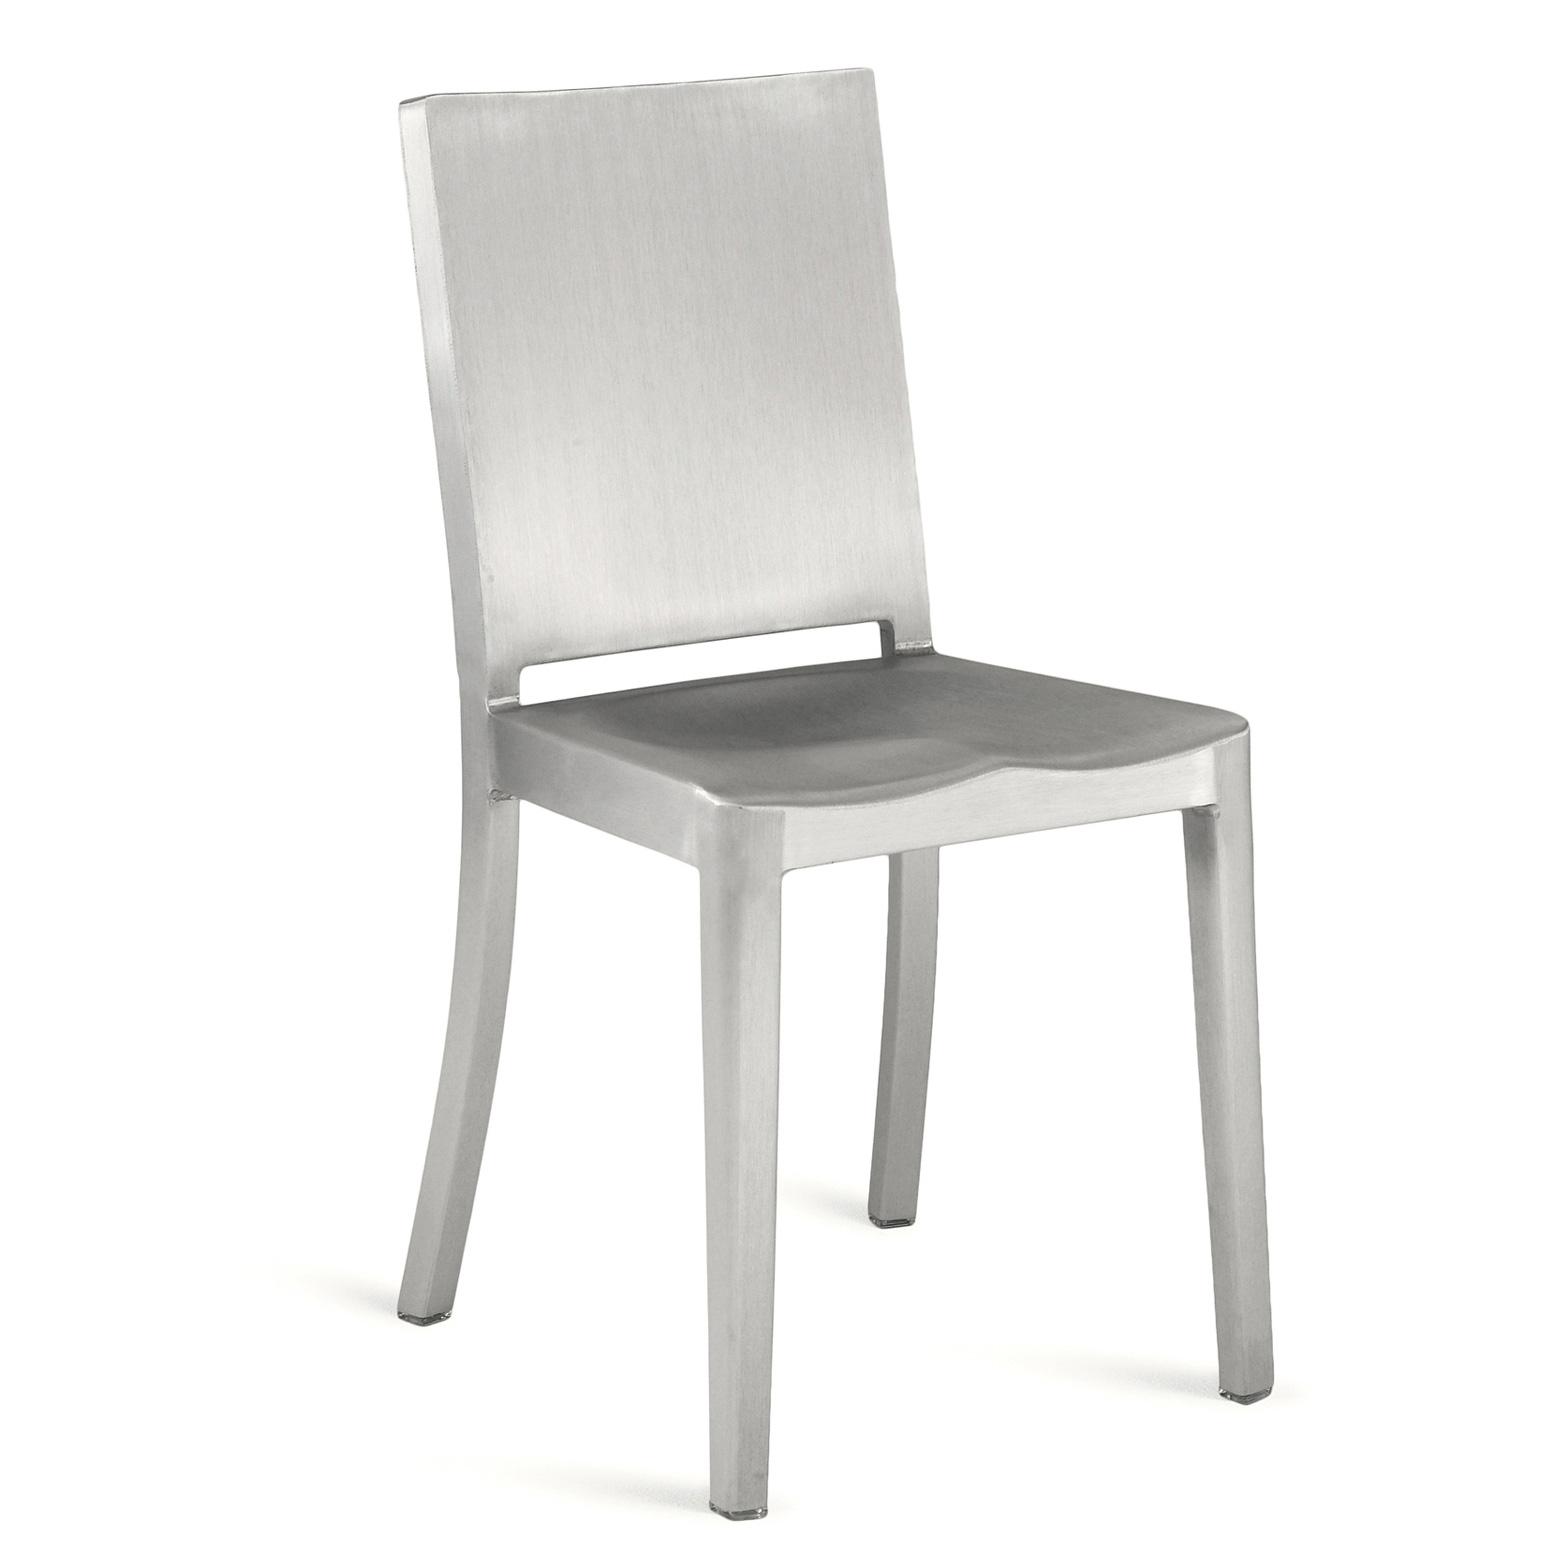 Emeco Hudson Chair Aluminium Brushed Designed By Philippe Starck